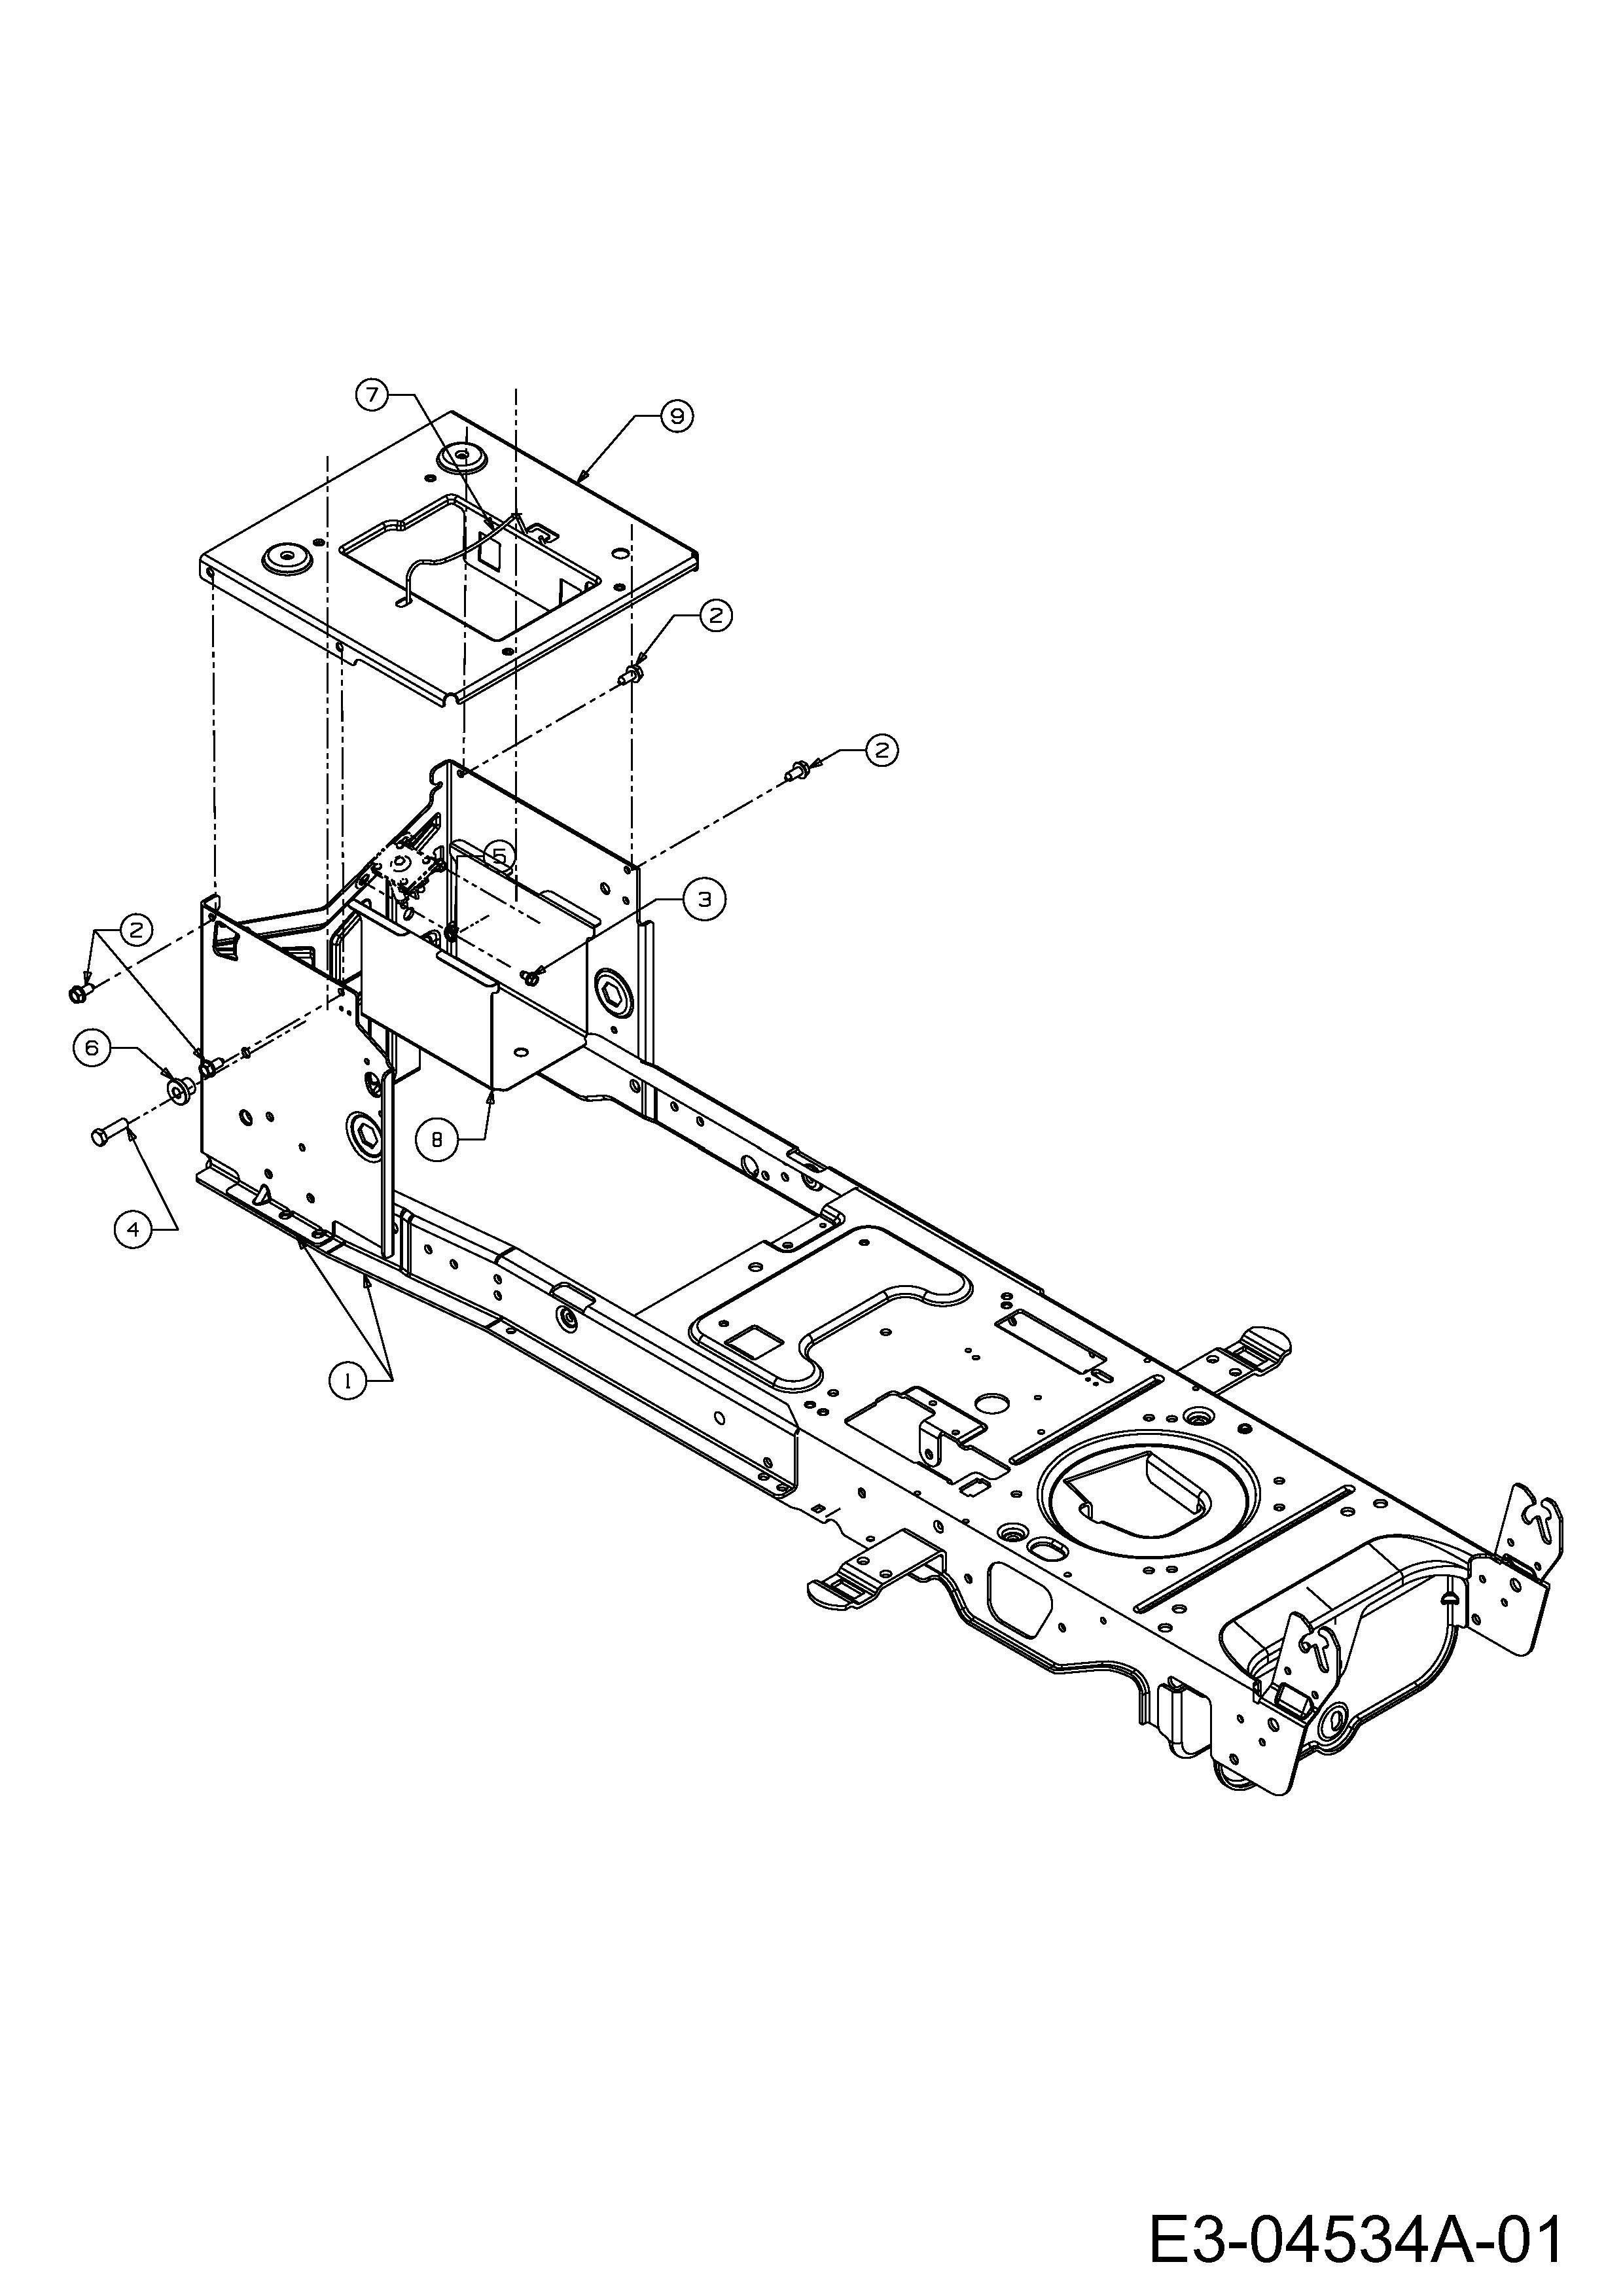 Trailer Plug Wiring Diagram 6 Way Nilzanet – 6 Way Wiring Diagram